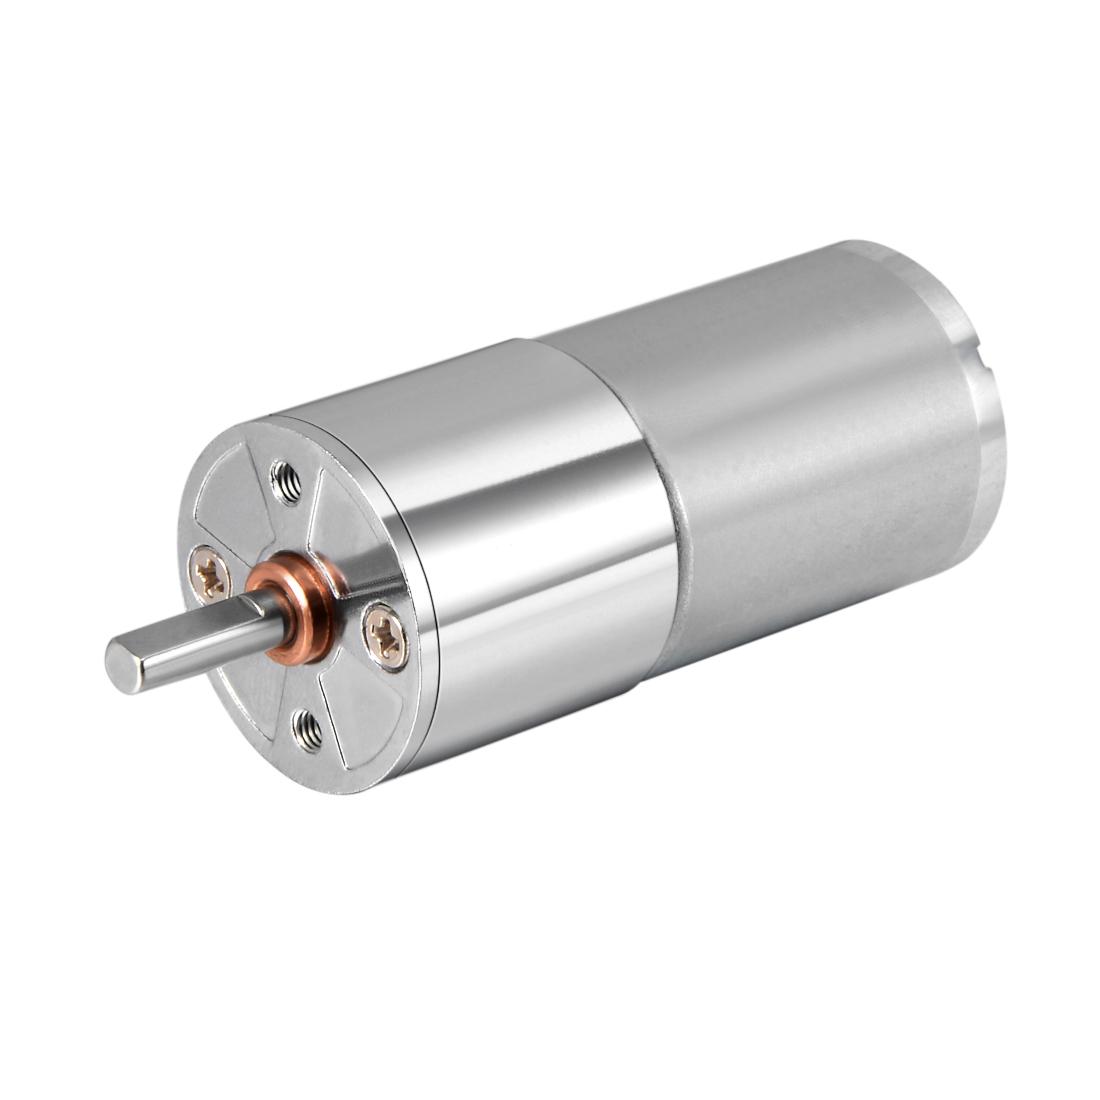 12V DC 80 RPM Gear Motor High Torque Reduction Gearbox Centric Output Shaft